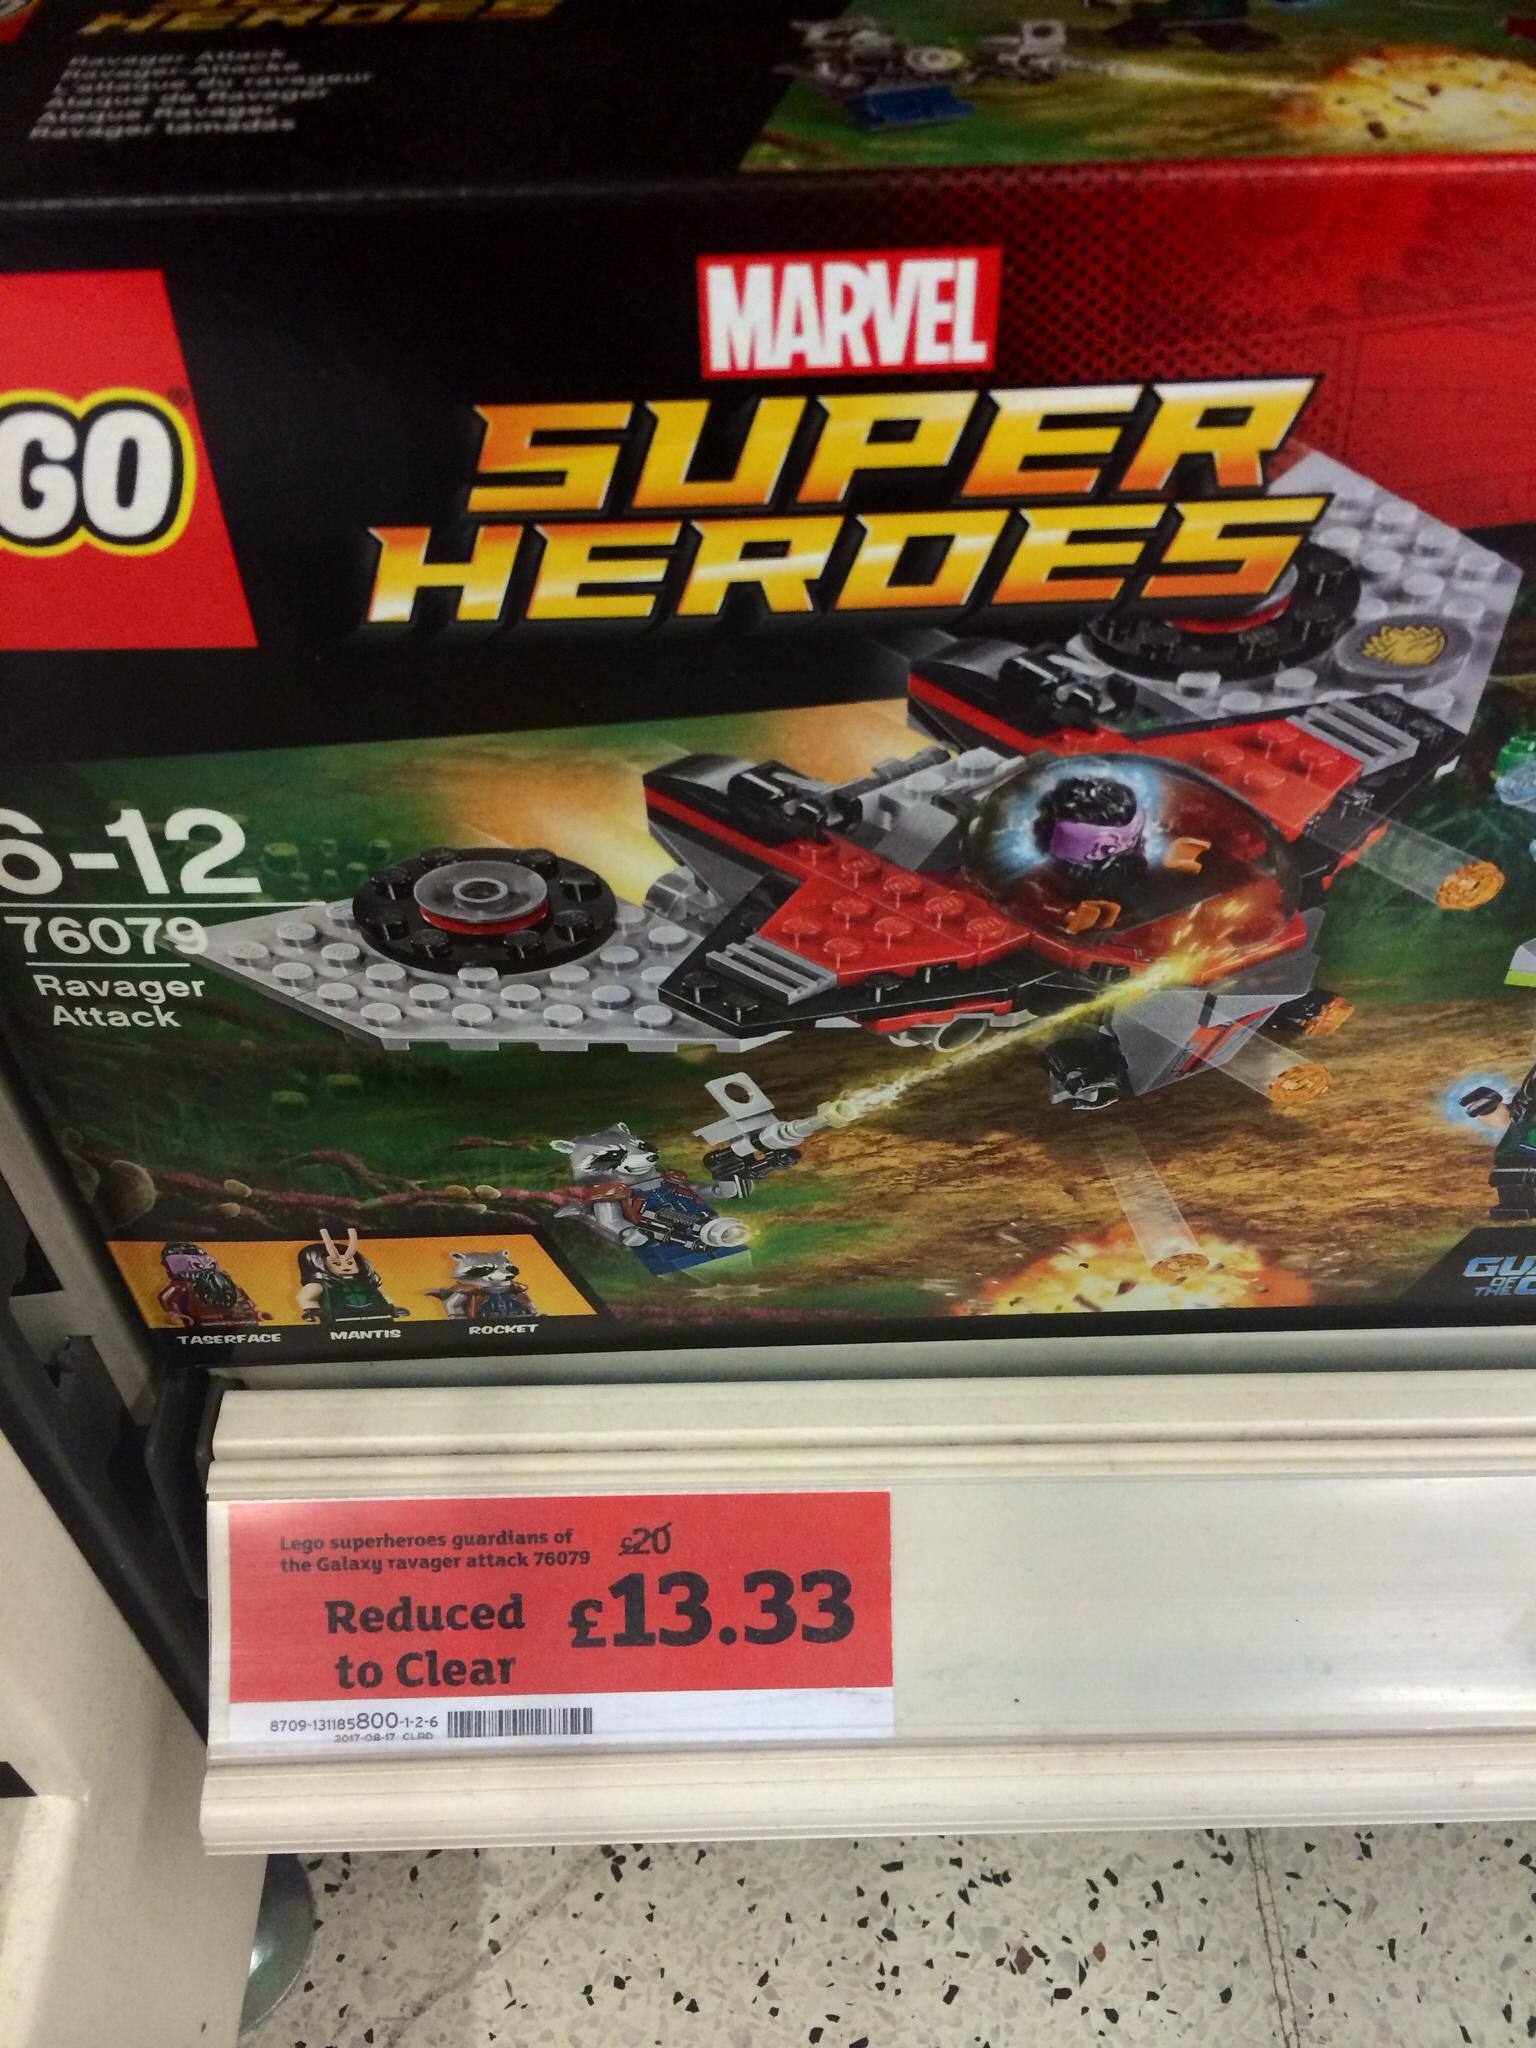 Lego Marvel 76079 GOTG Ravager Attack £13.33 @ Sainsbury's - Lisburn & Holywood Exchange Stores